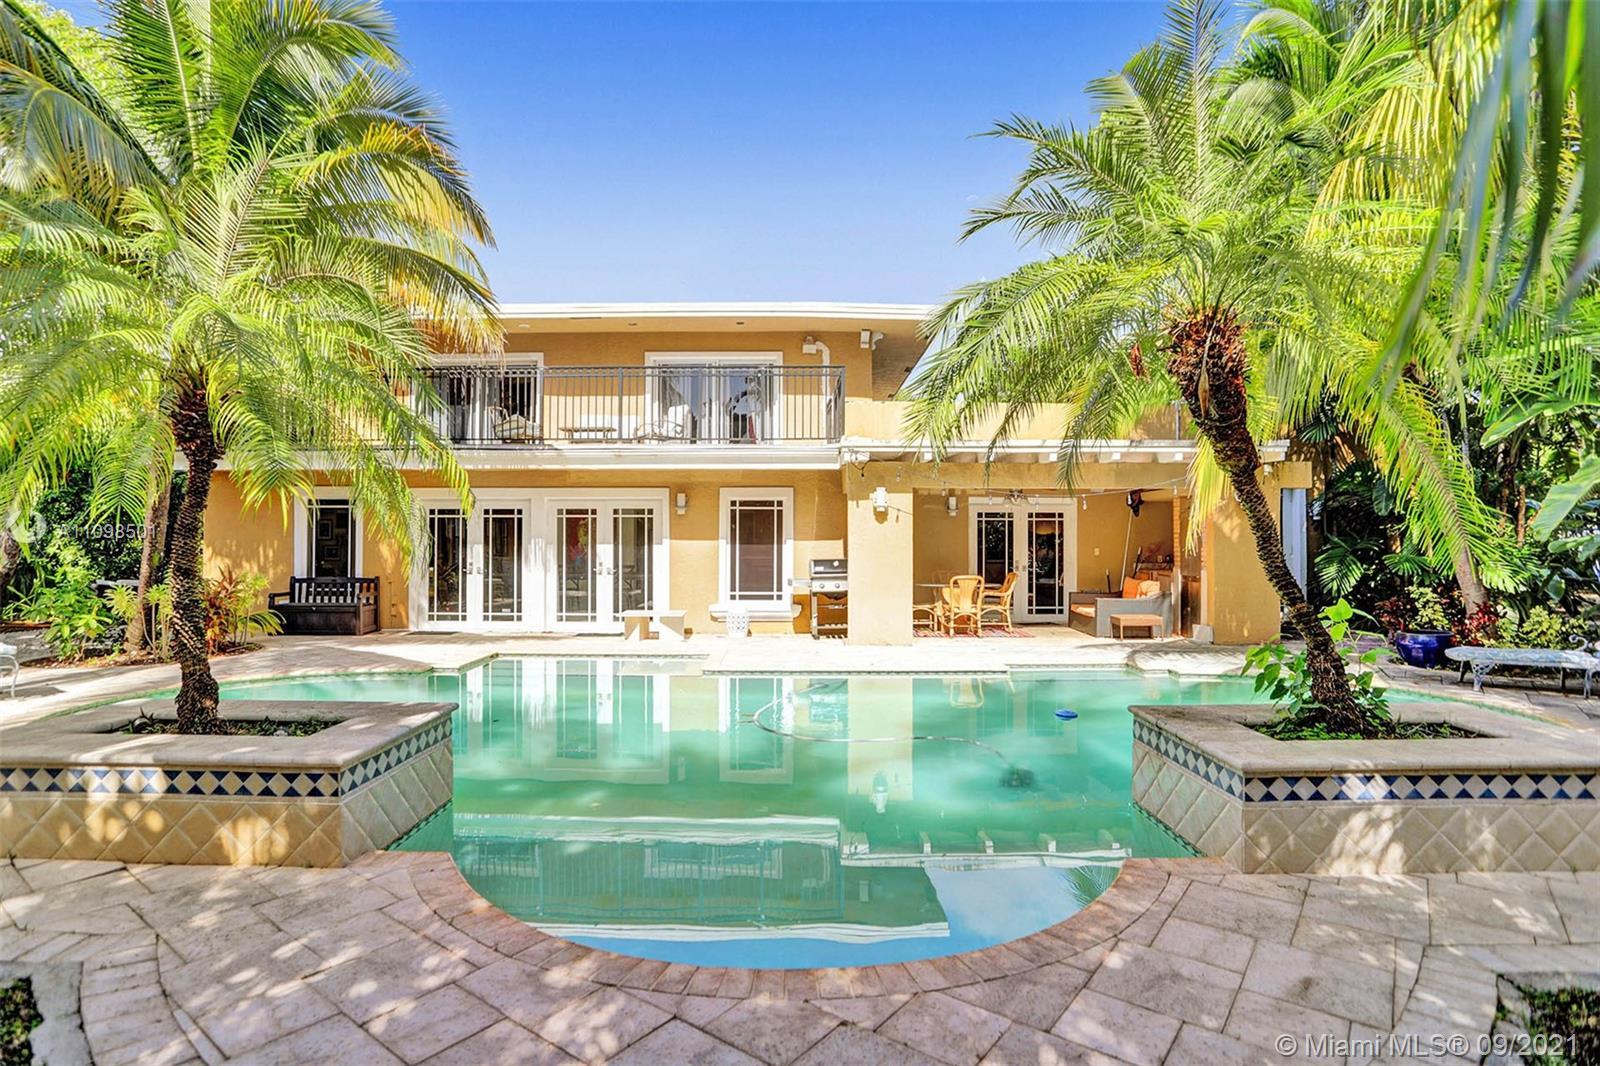 Keystone Point - 1855 NE 124th St, North Miami, FL 33181-2612